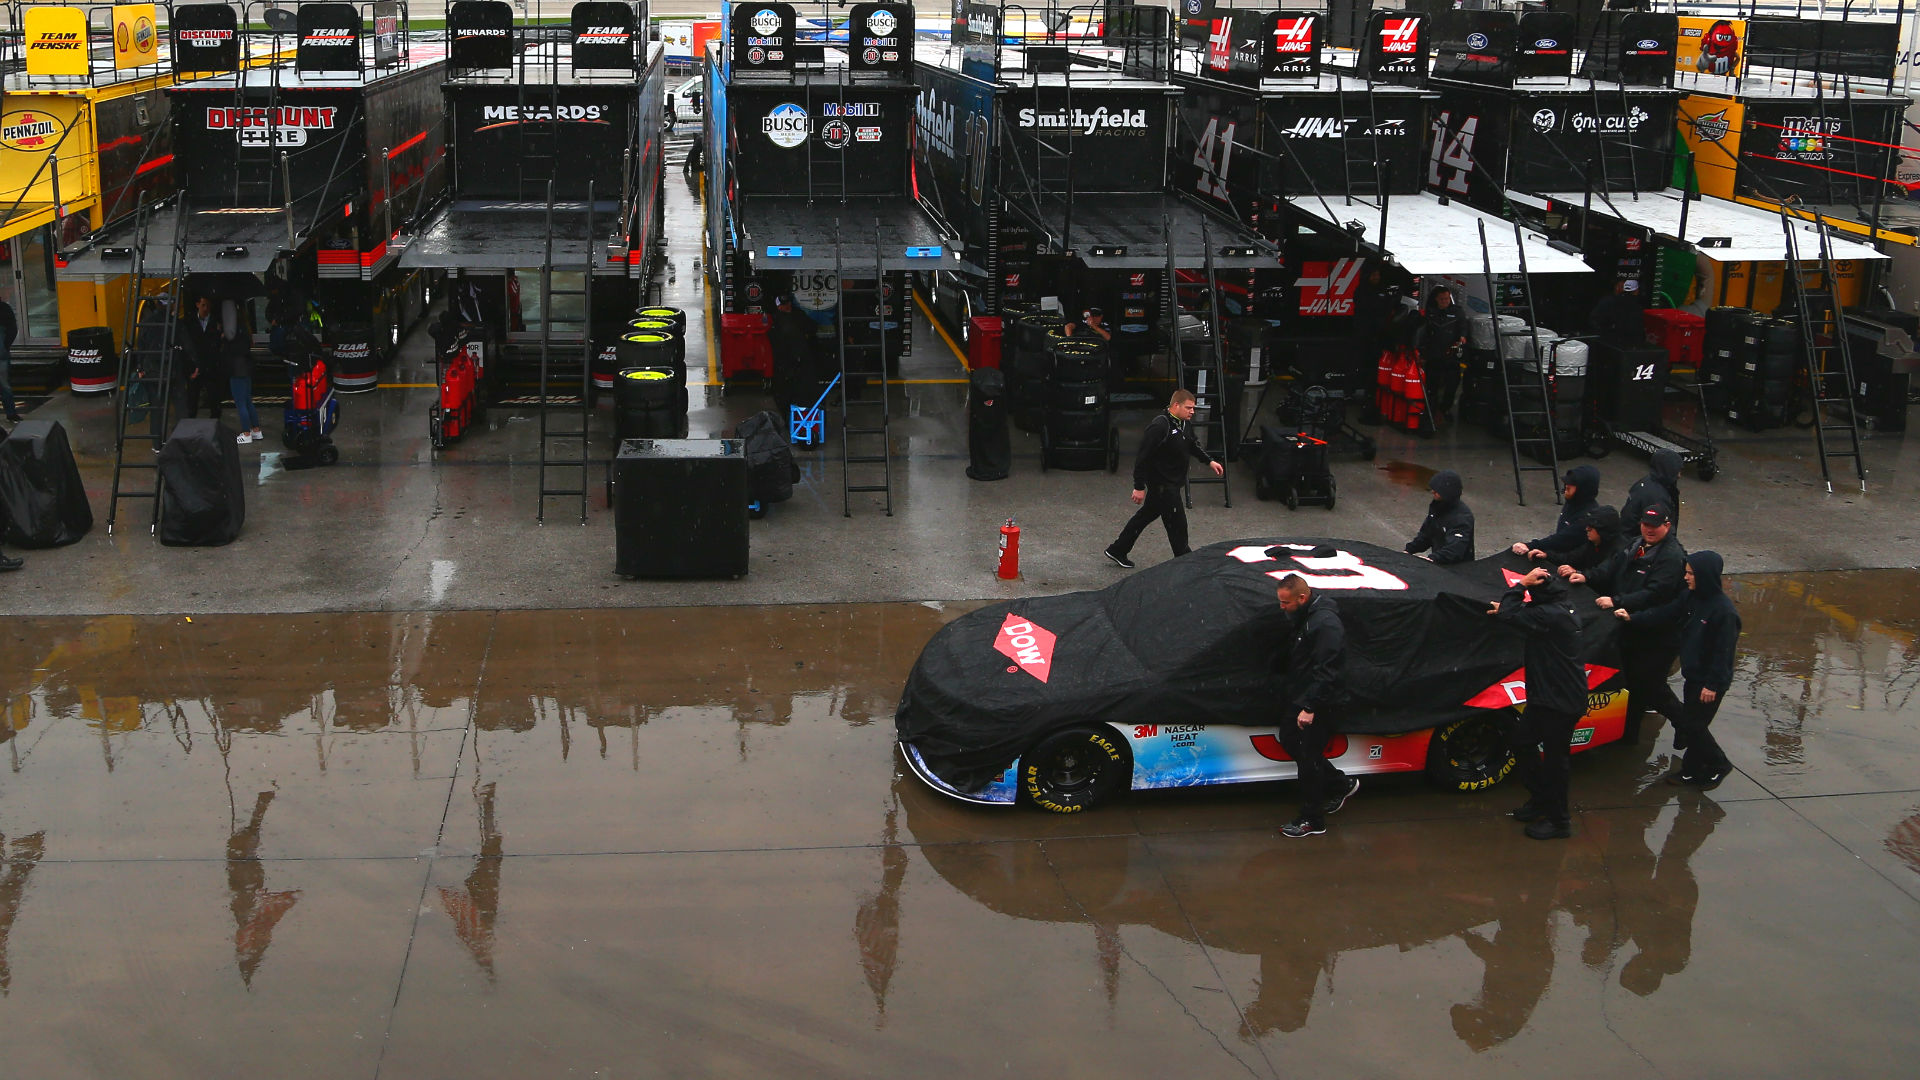 NASCAR race weather: Will rain delay the Richmond race?